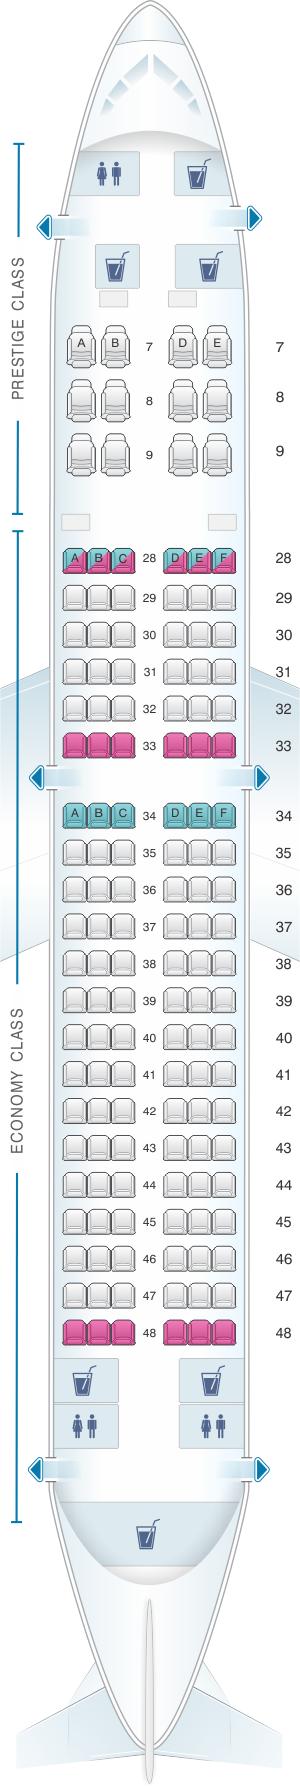 Seat map for Korean Air Boeing B737 800 138PAX